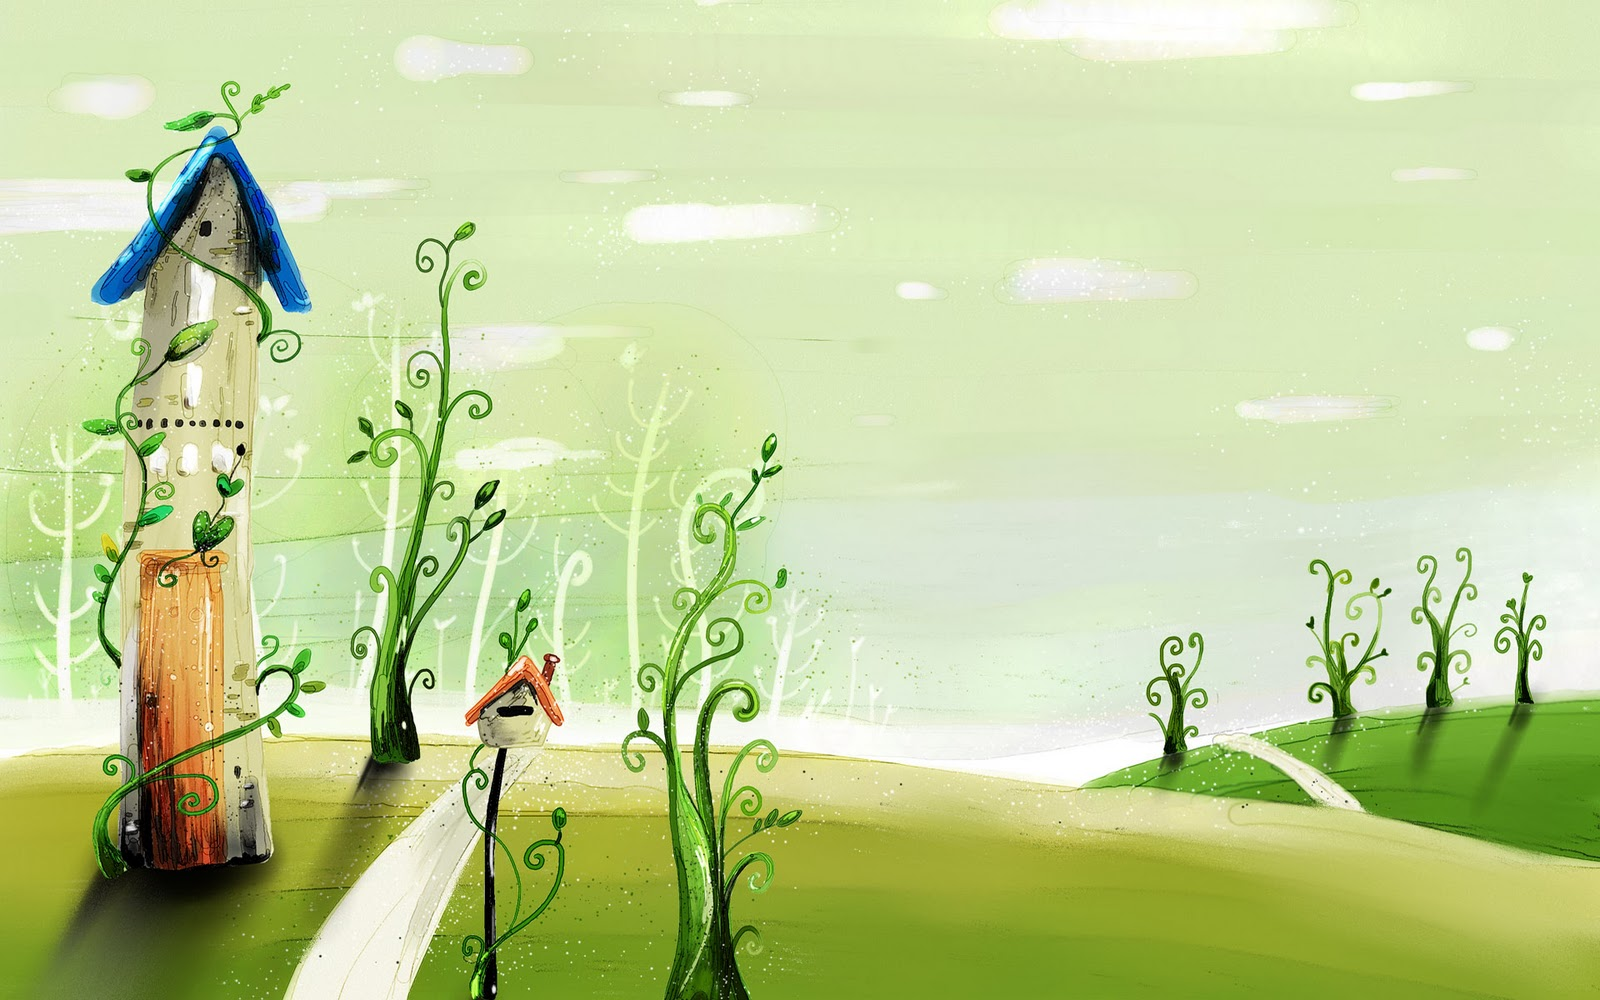 http://2.bp.blogspot.com/-PNJOA2xhUpc/TwJ3mgMtyOI/AAAAAAAAJPQ/UnsnNyUuvgA/s1600/cartoon+wallpaper_19.jpg